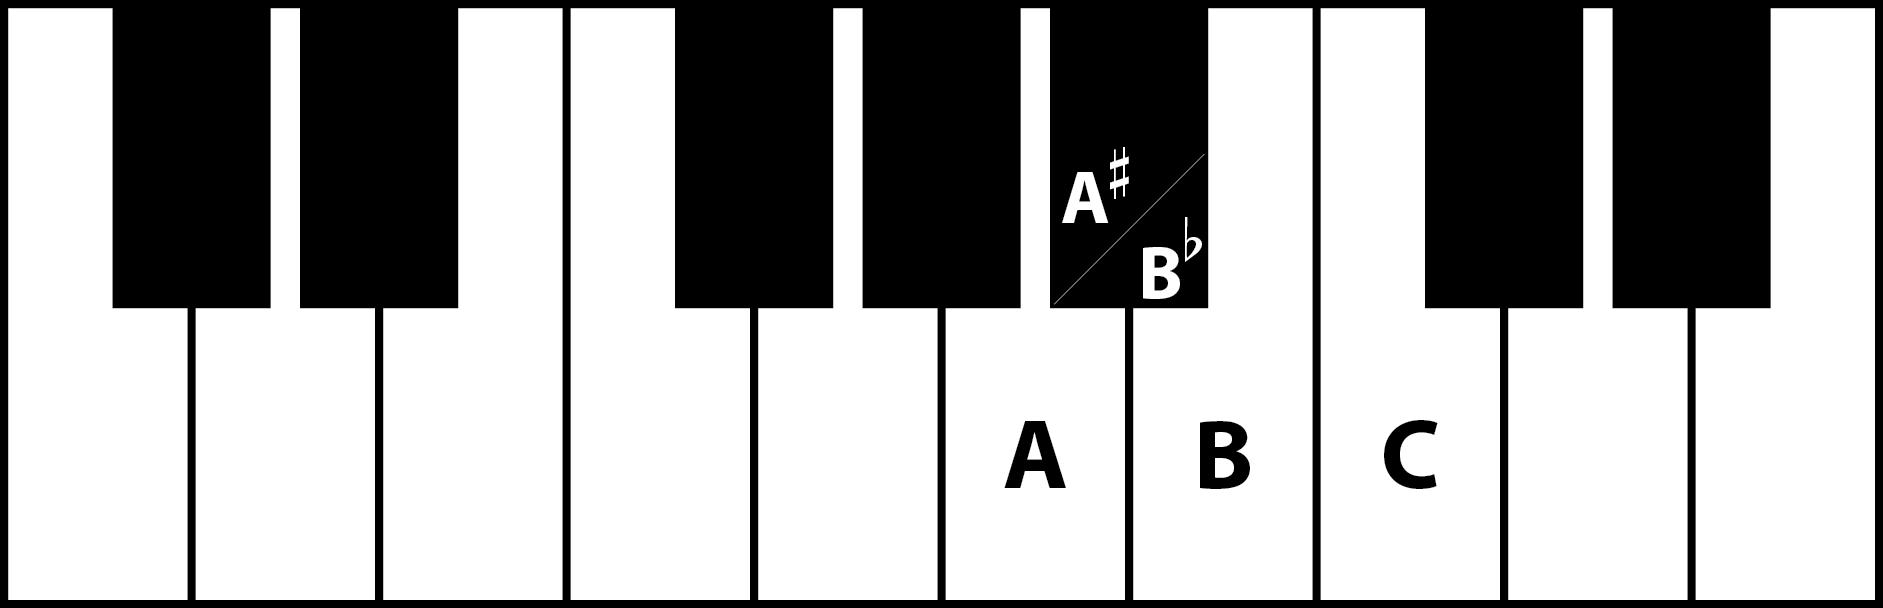 C Flat Major Scale Minor Key Signature